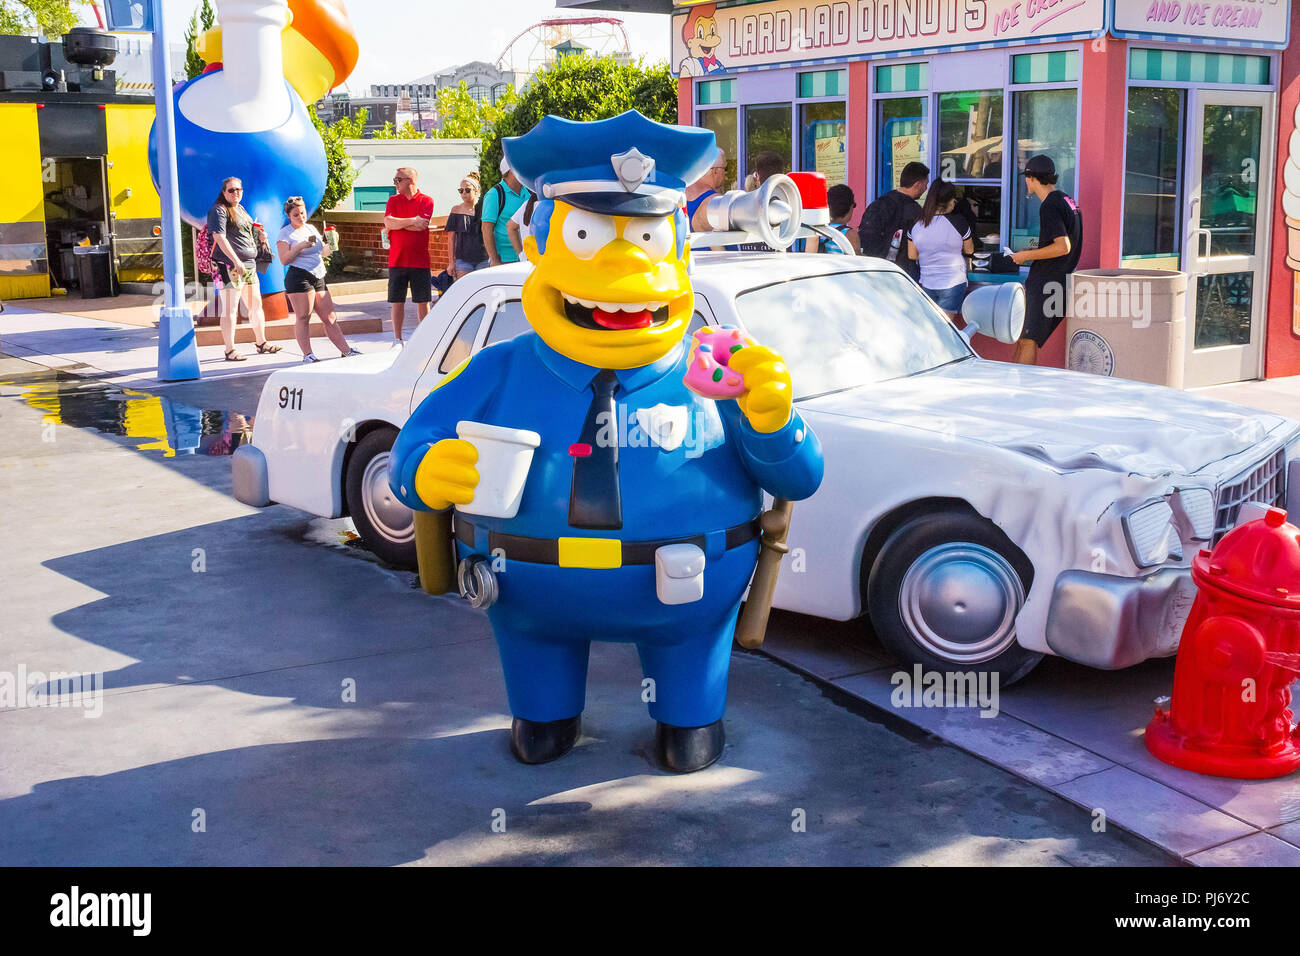 Map Of Universal Studios Florida.Orlando Florida Usa May 10 2018 The People Going At Park